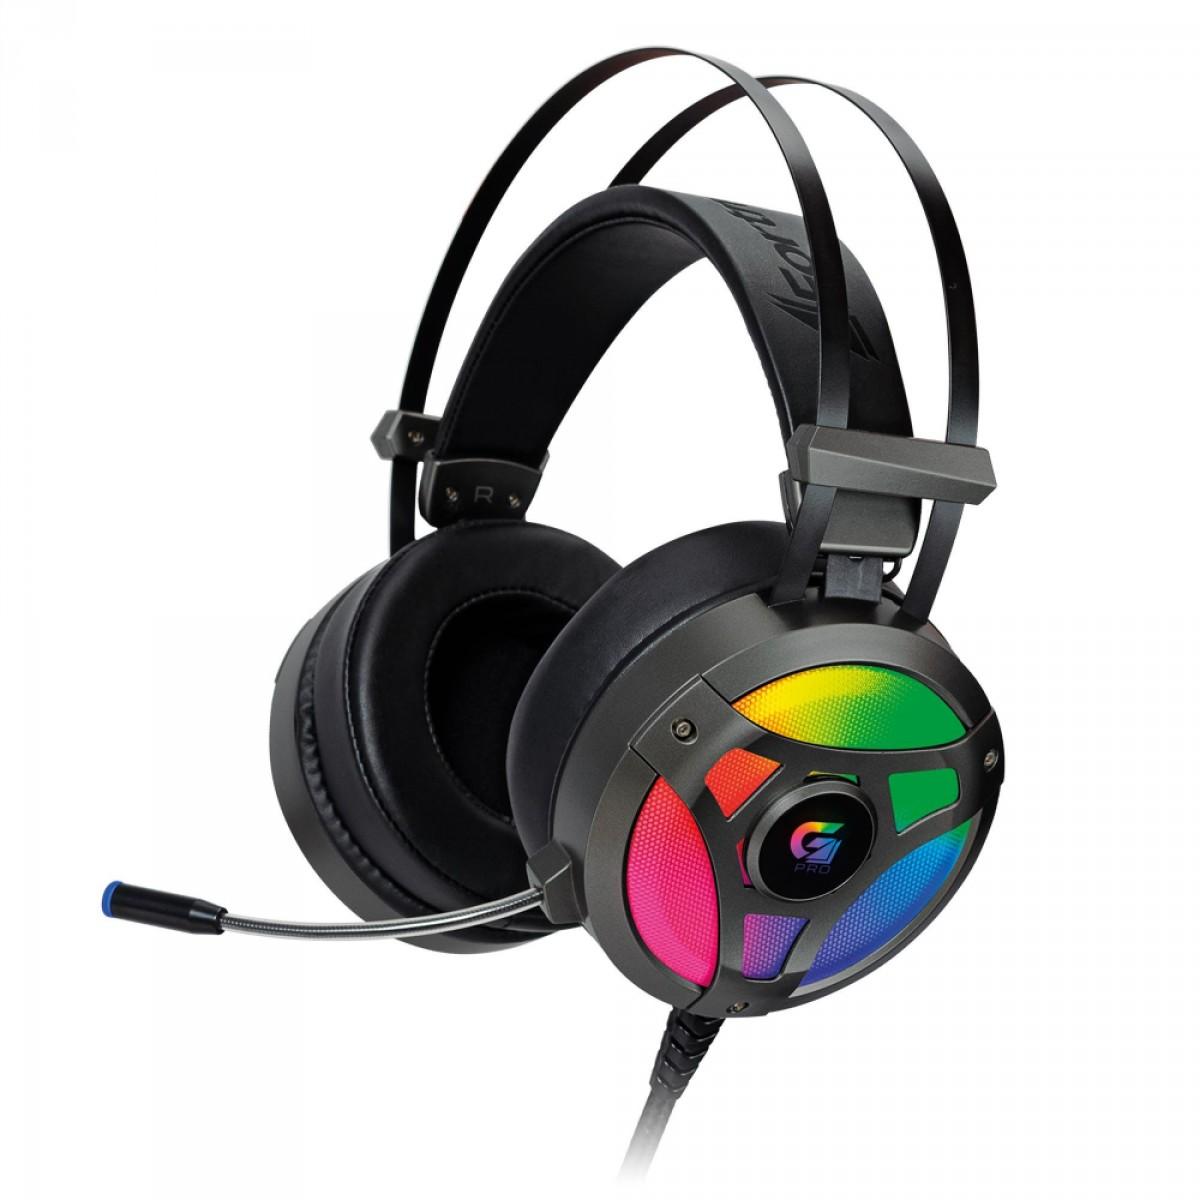 Headset Gamer Fortrek G Pro H1+ 7.1, RGB,  Cinza, G-Pro, 65905